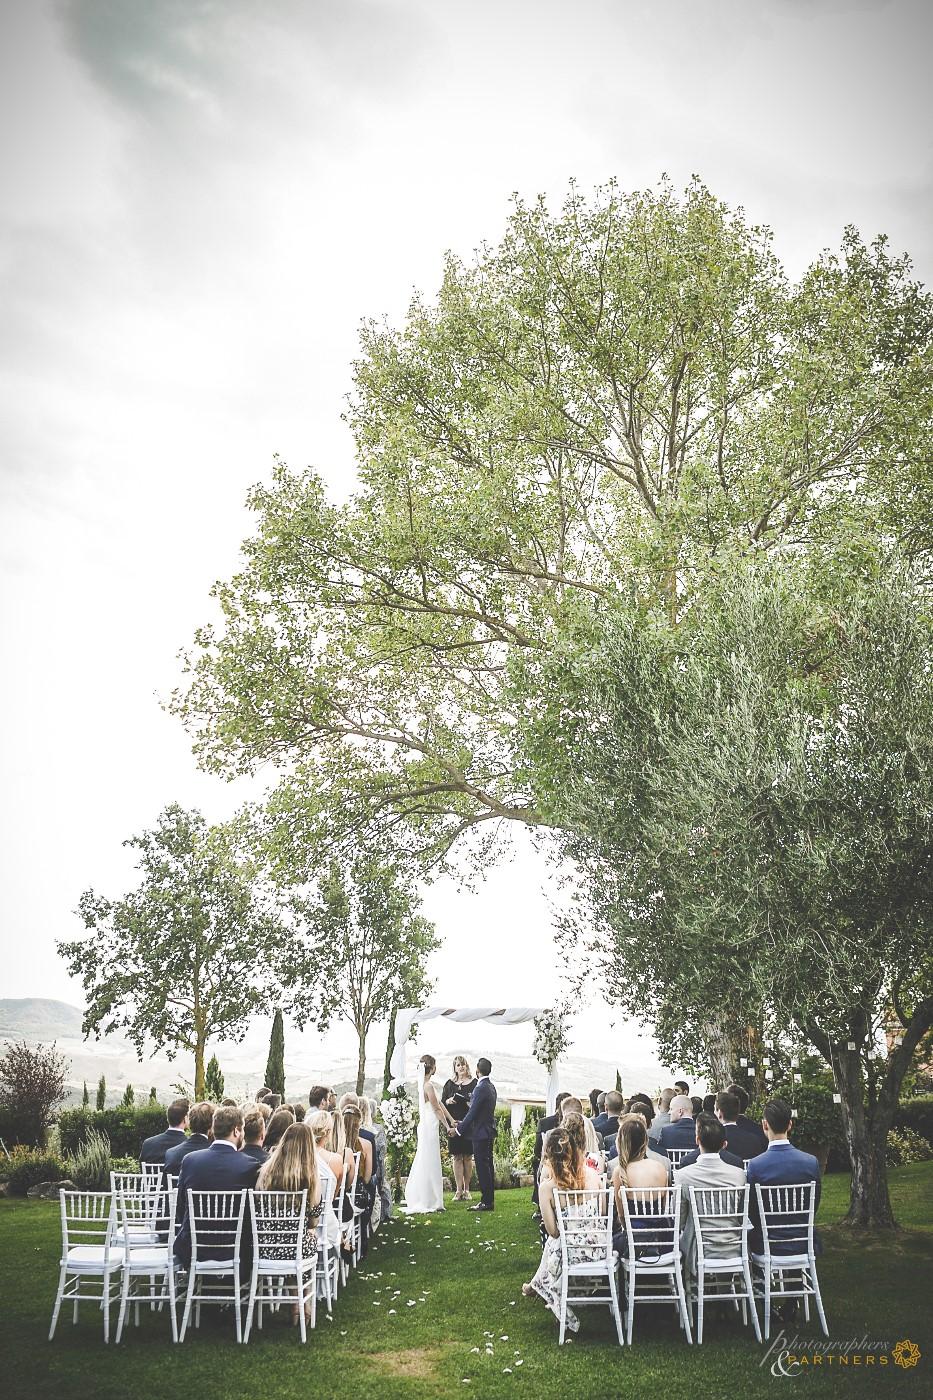 wedding_photos_tenuta_quadrifoglio_06.jpg